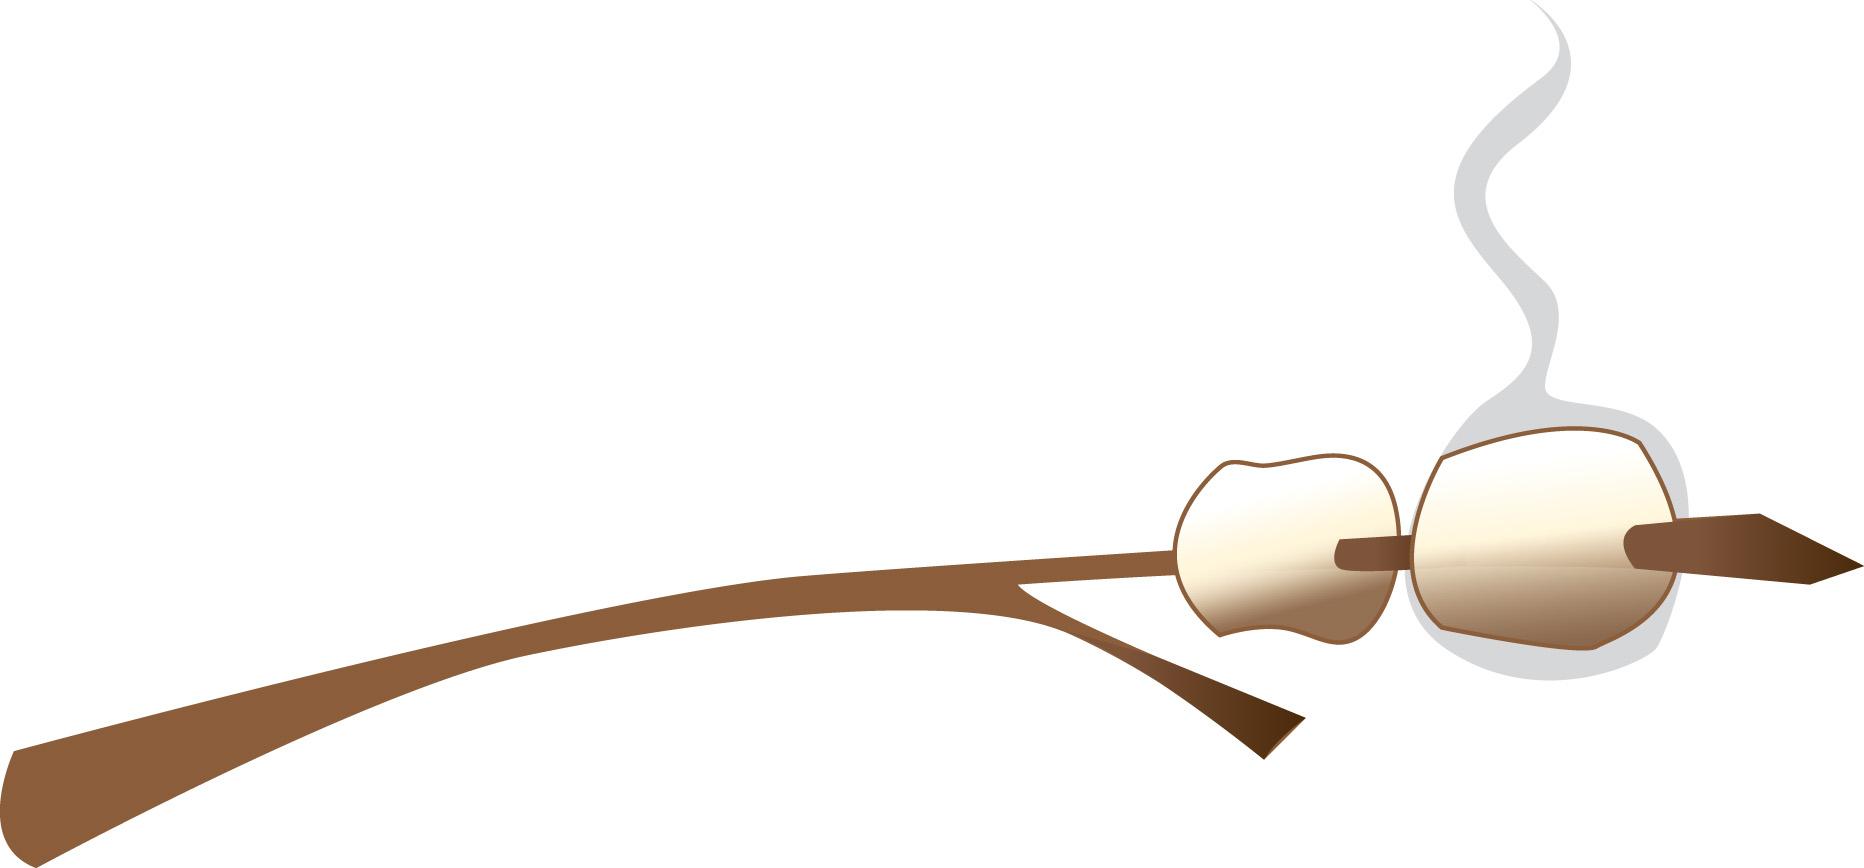 1864x868 Marshmallow Clip Art 2 Wikiclipart